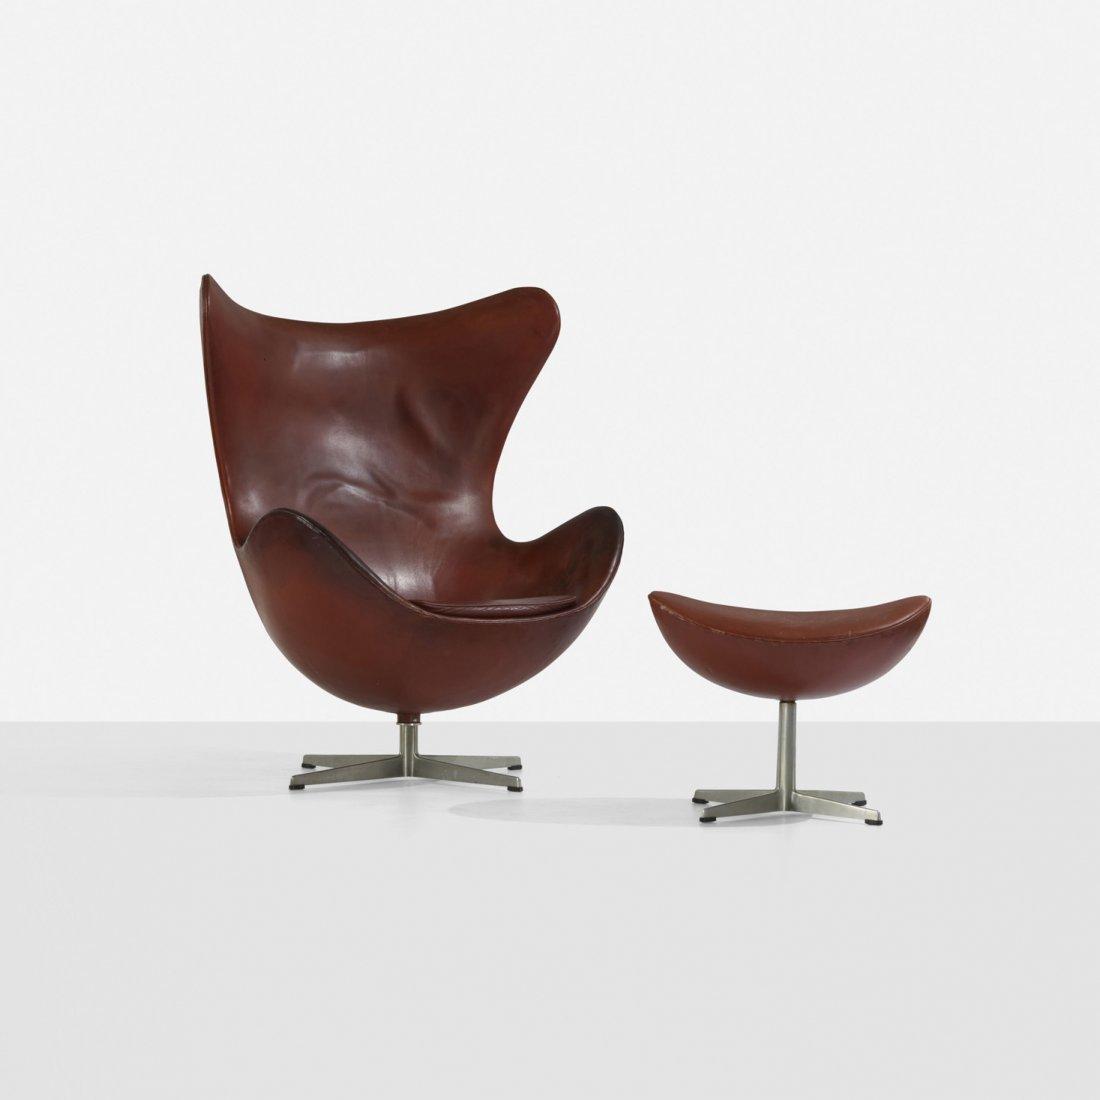 189: Arne Jacobsen Egg chair and ottoman